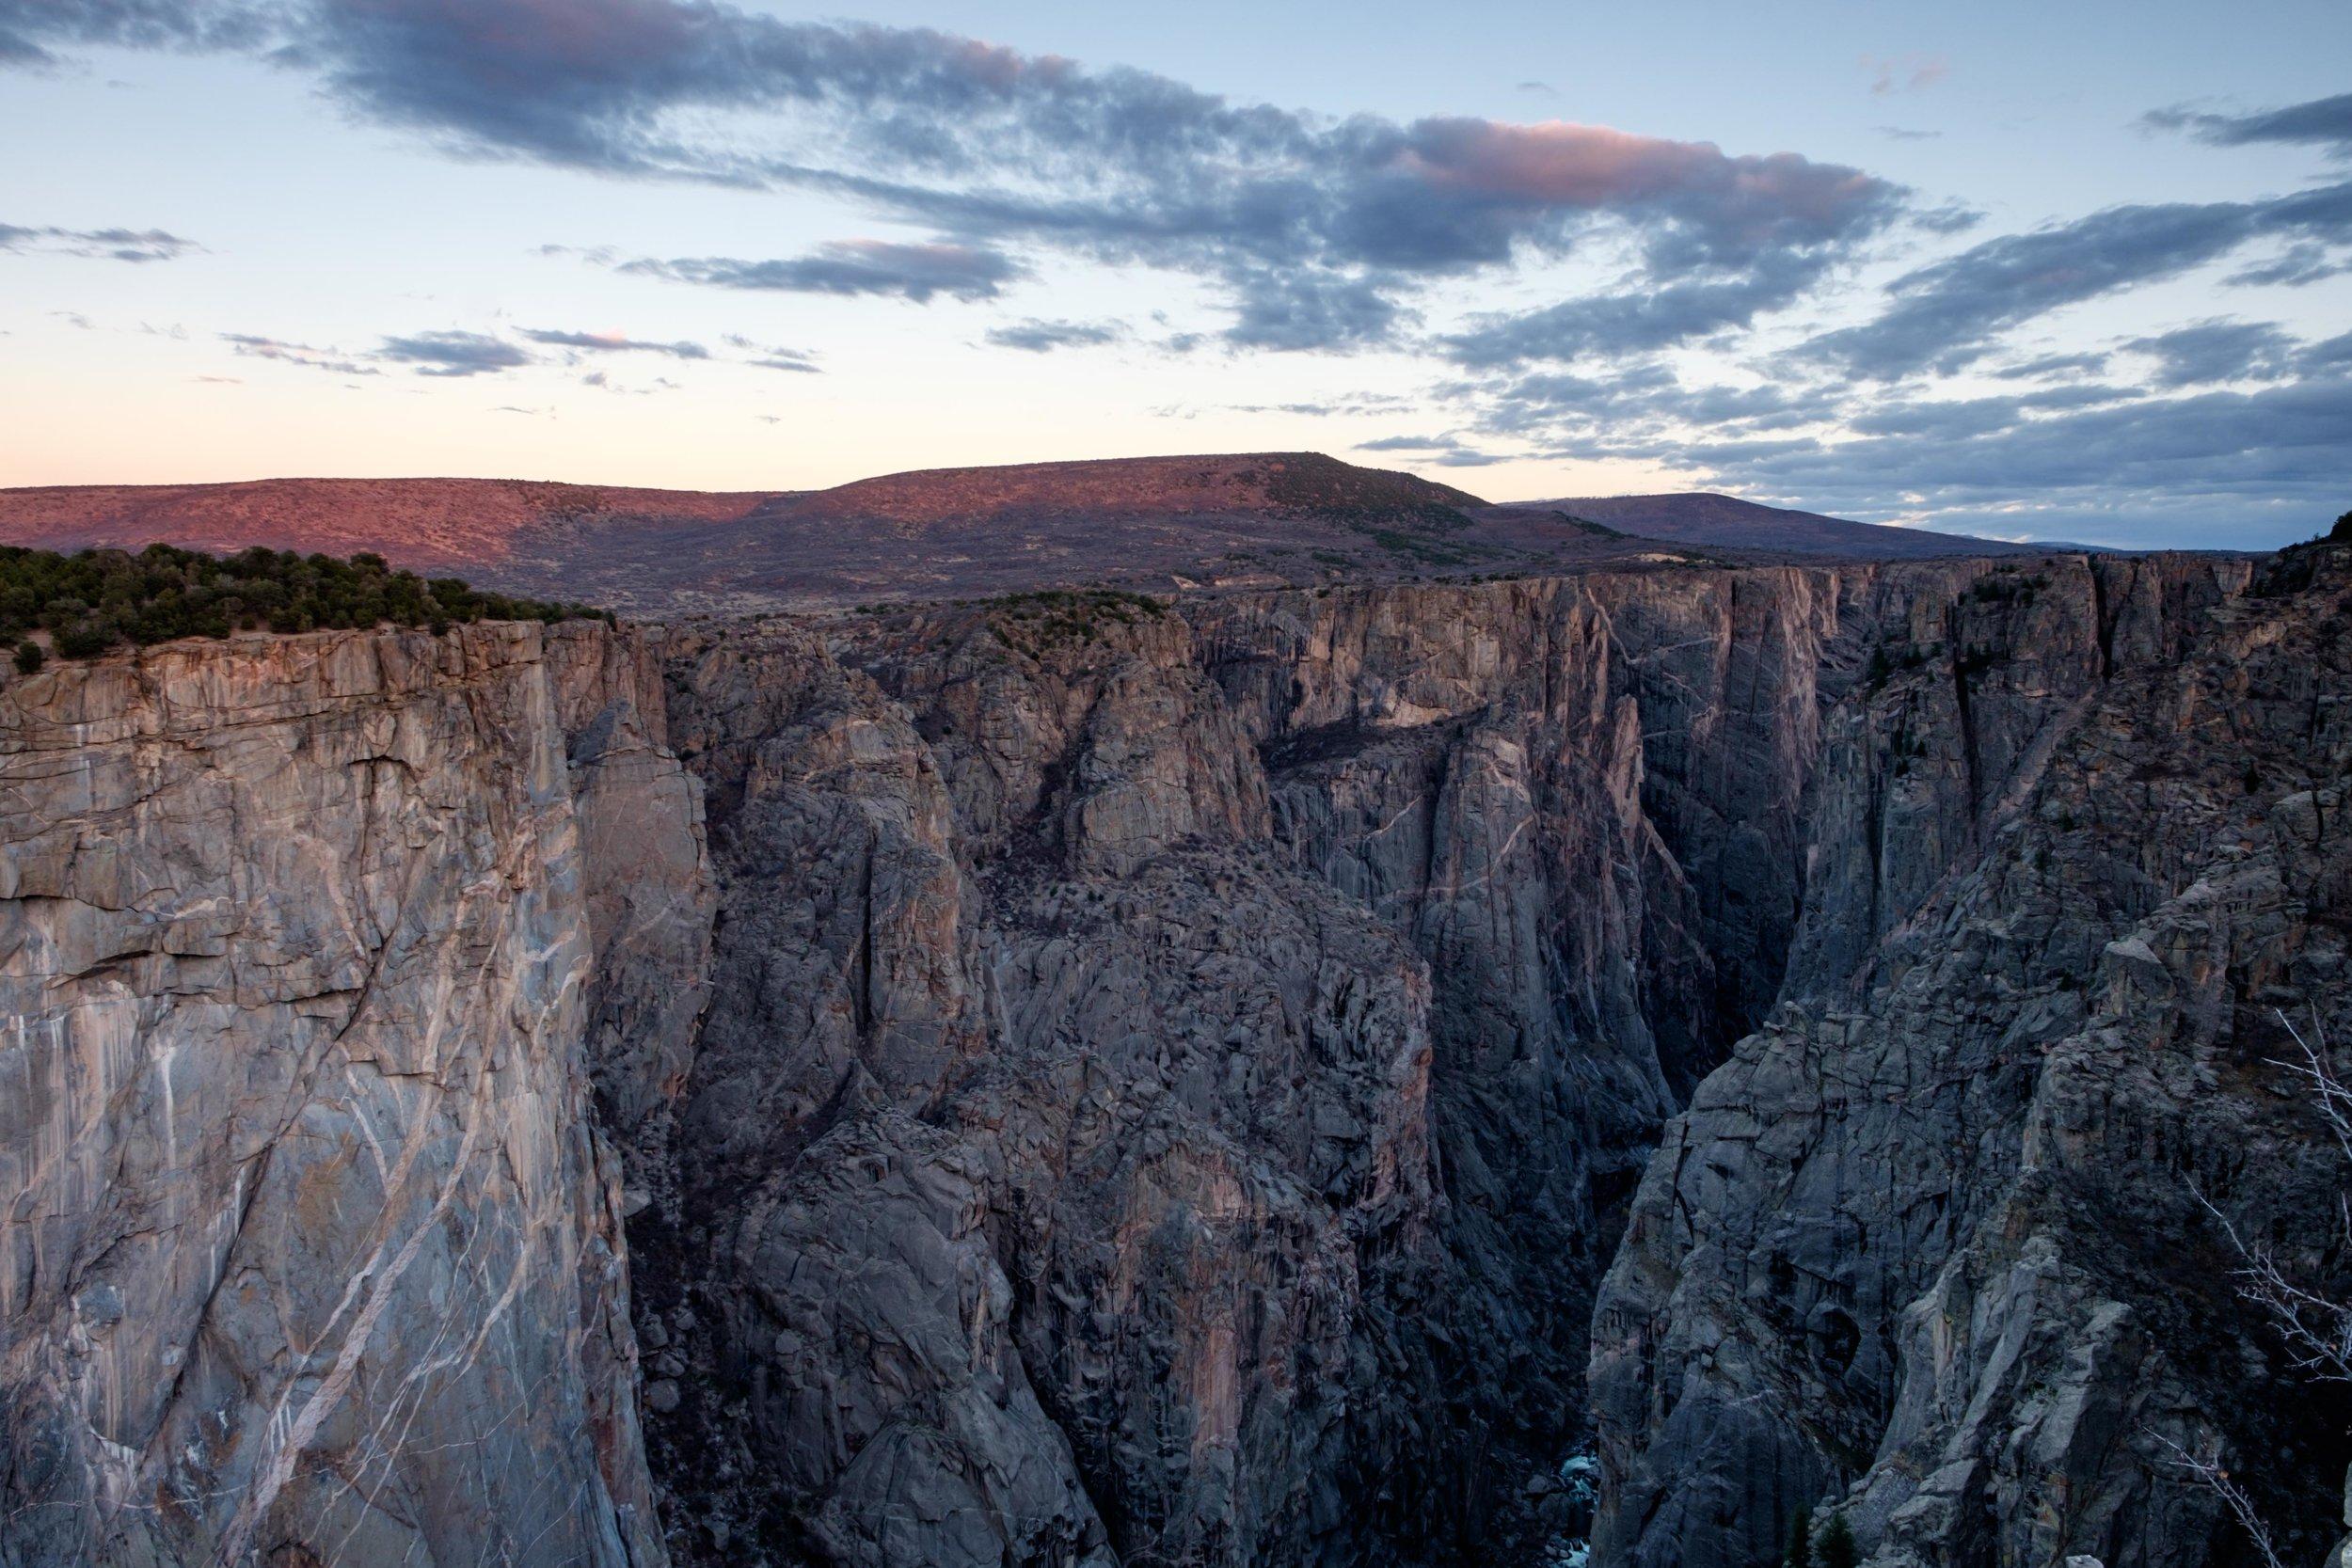 Black Canyon of the Gunnison National Park - 008.jpg